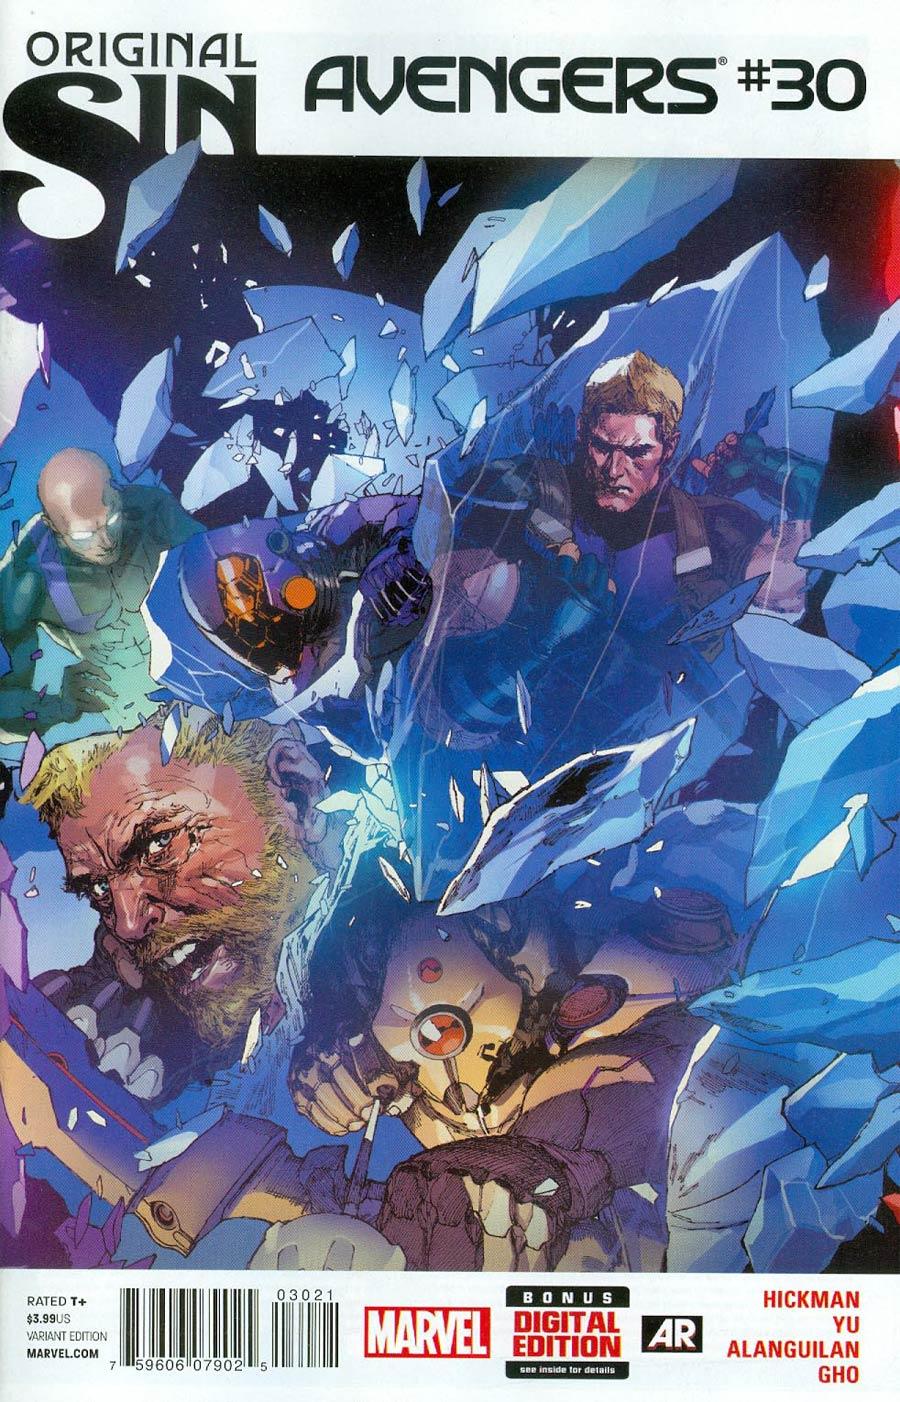 Avengers Vol 5 #30 Cover B Variant Leinil Francis Yu Cover (Original Sin Tie-In)